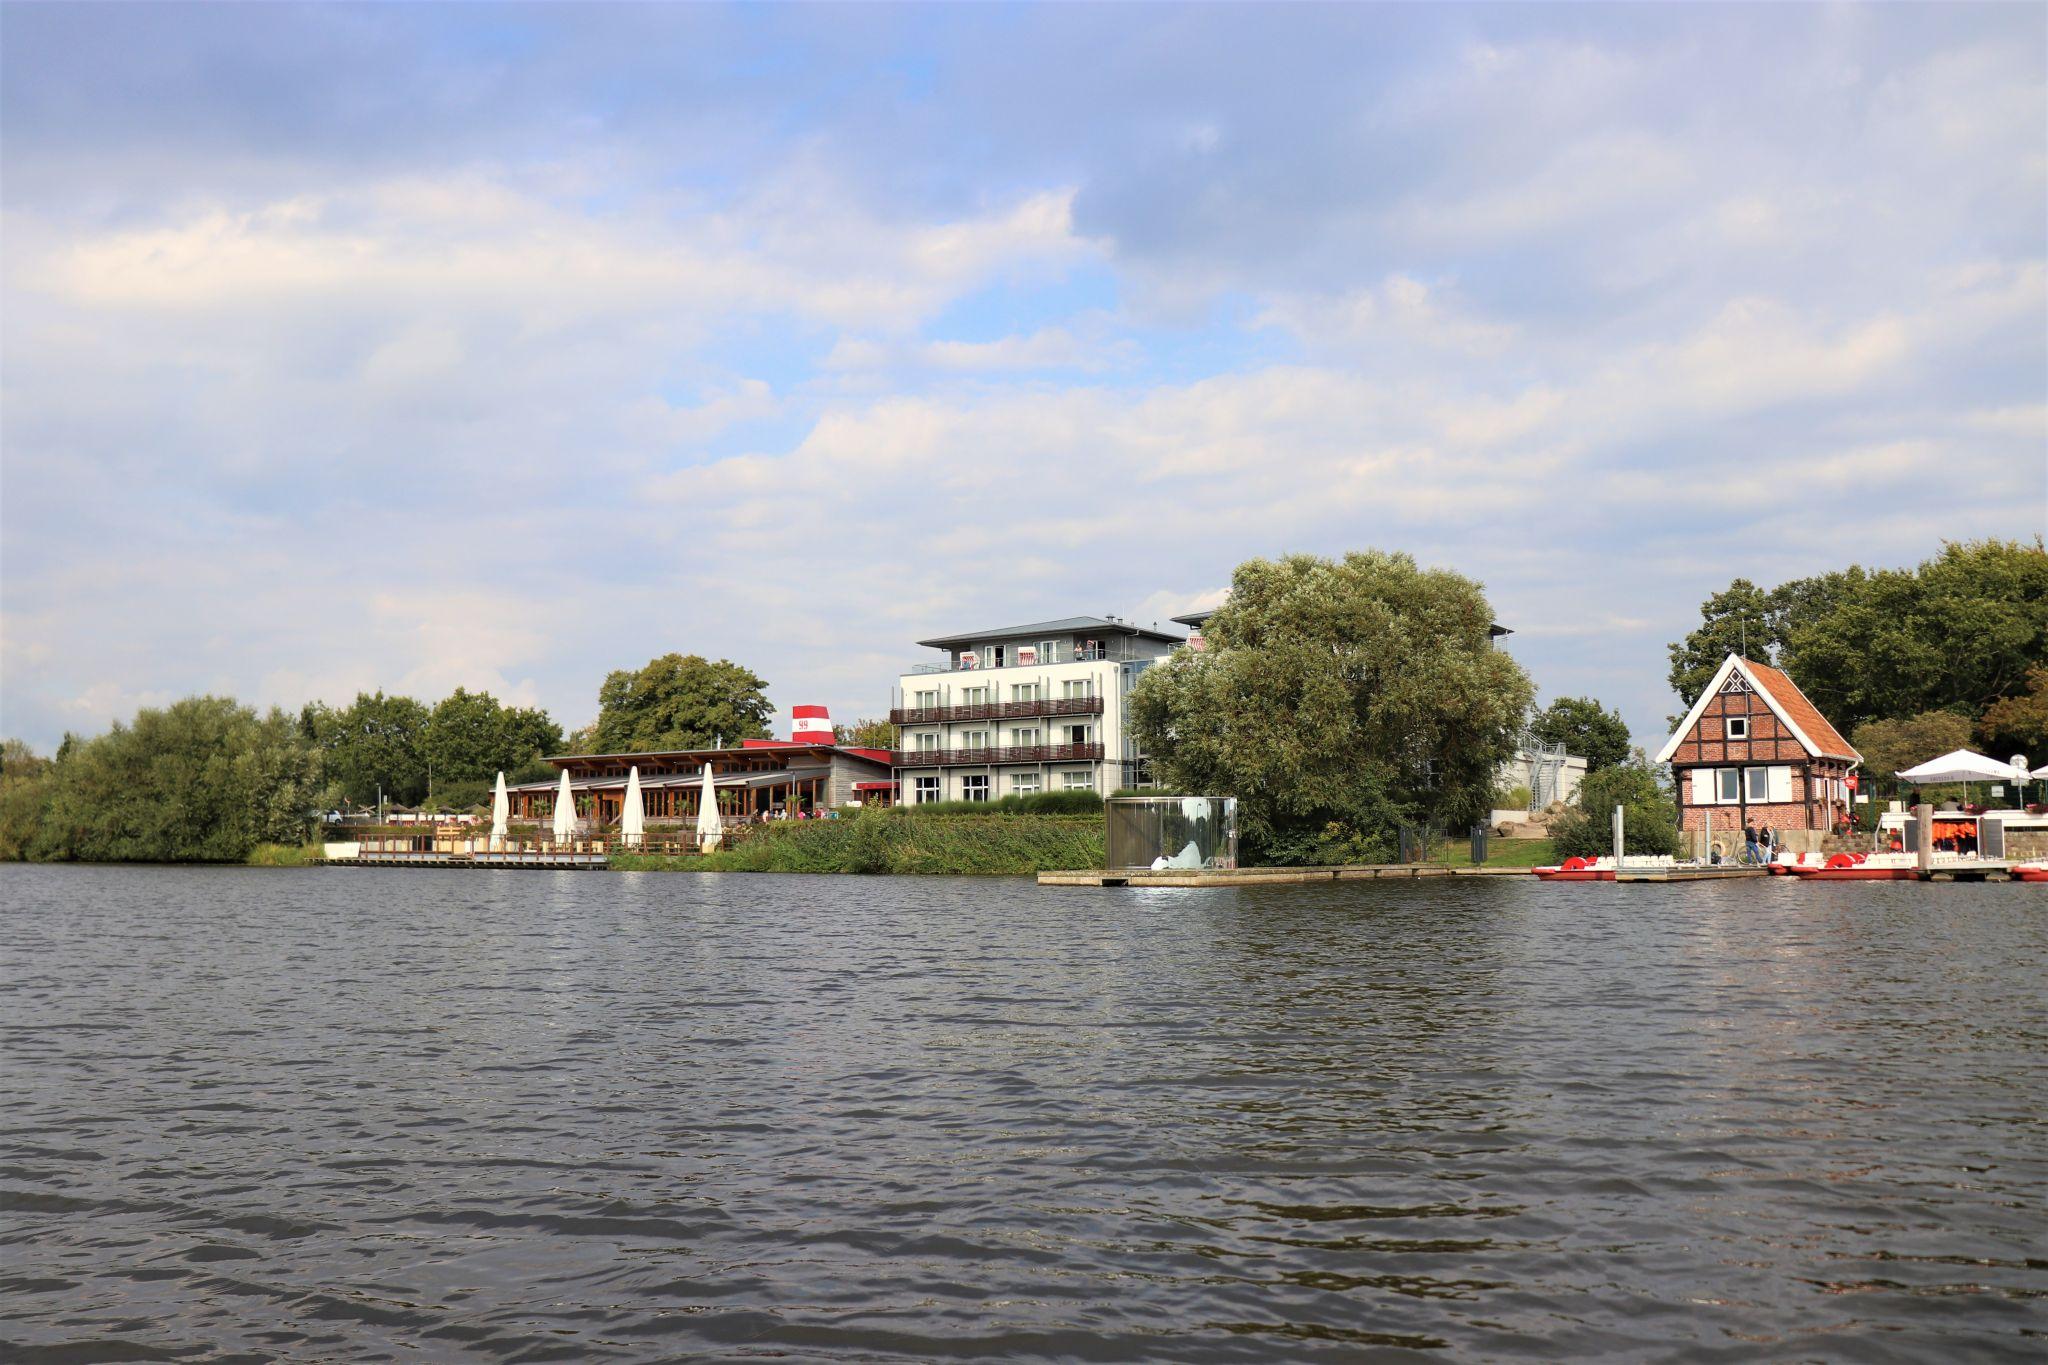 Vechtesee in Nordhorn, Germany